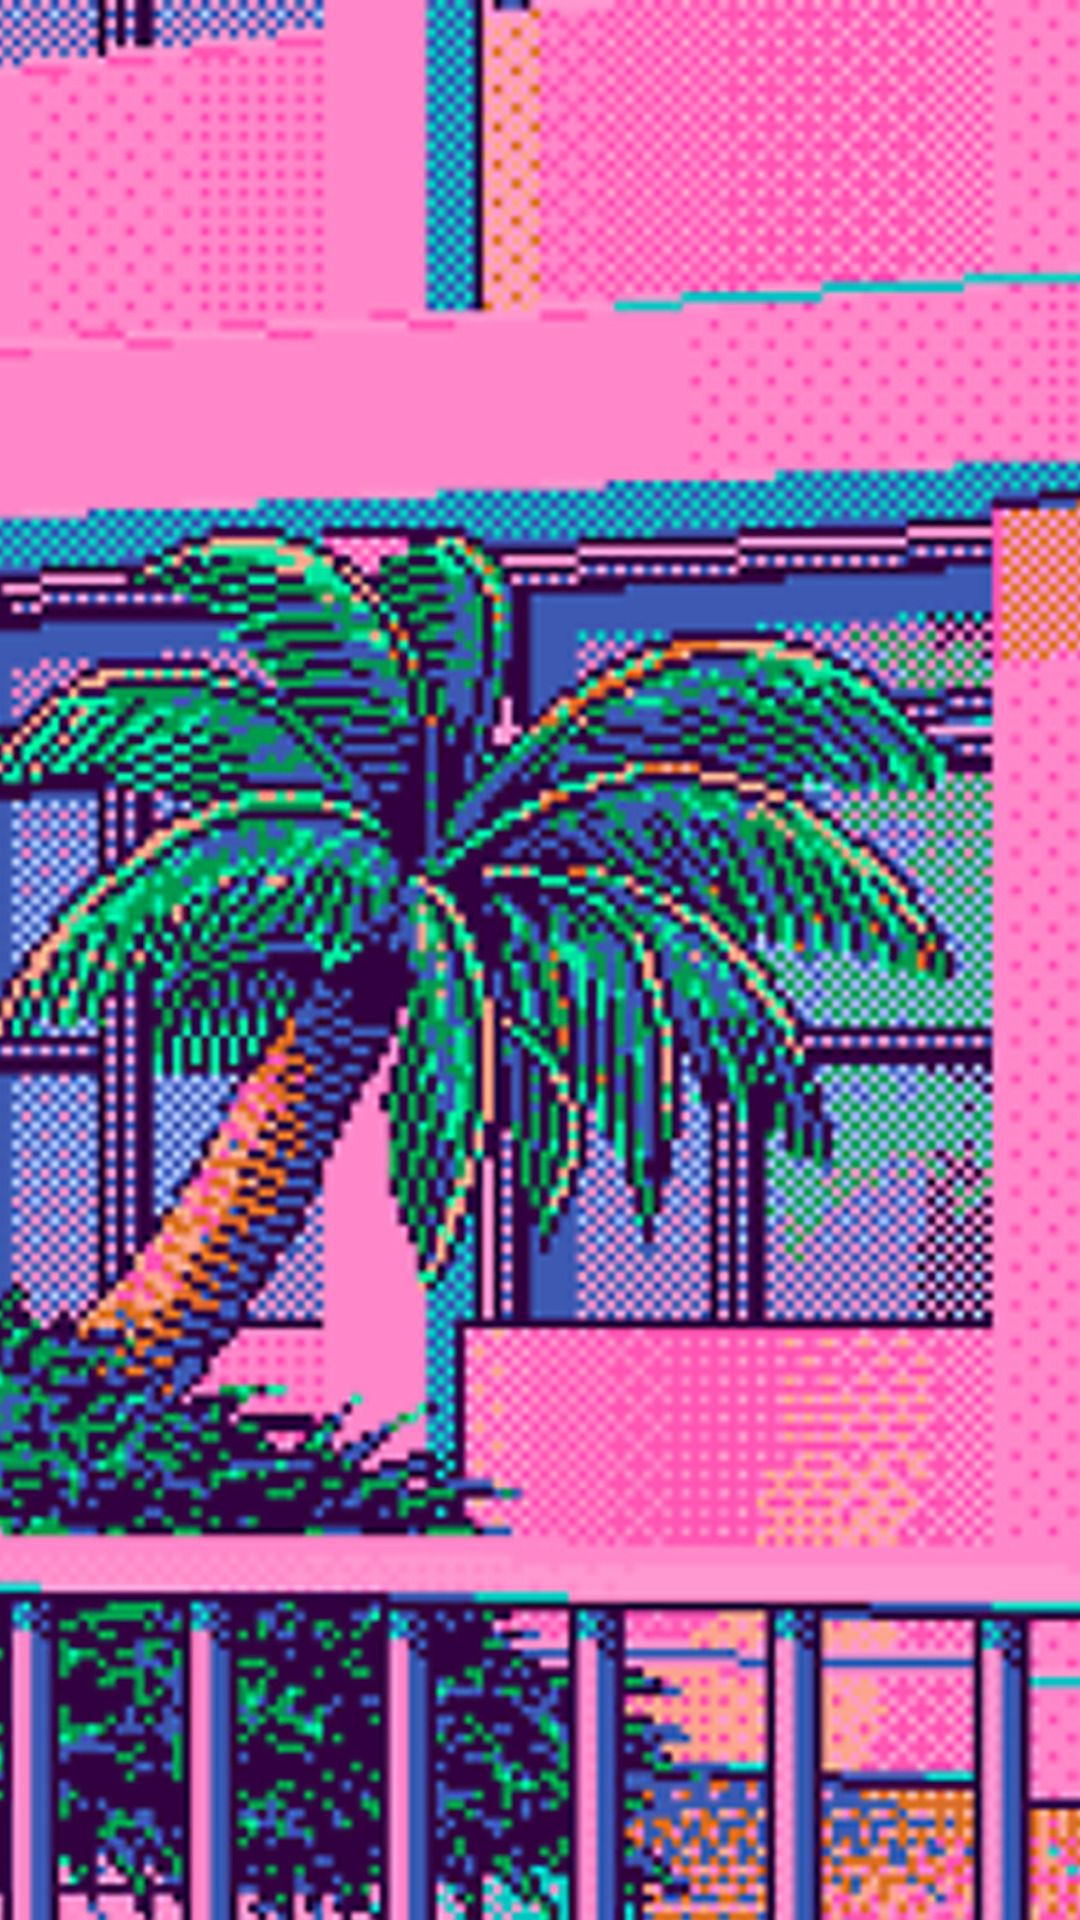 Pixel Art Wallpaper Tumblr In 2019 Vaporwave Wallpaper